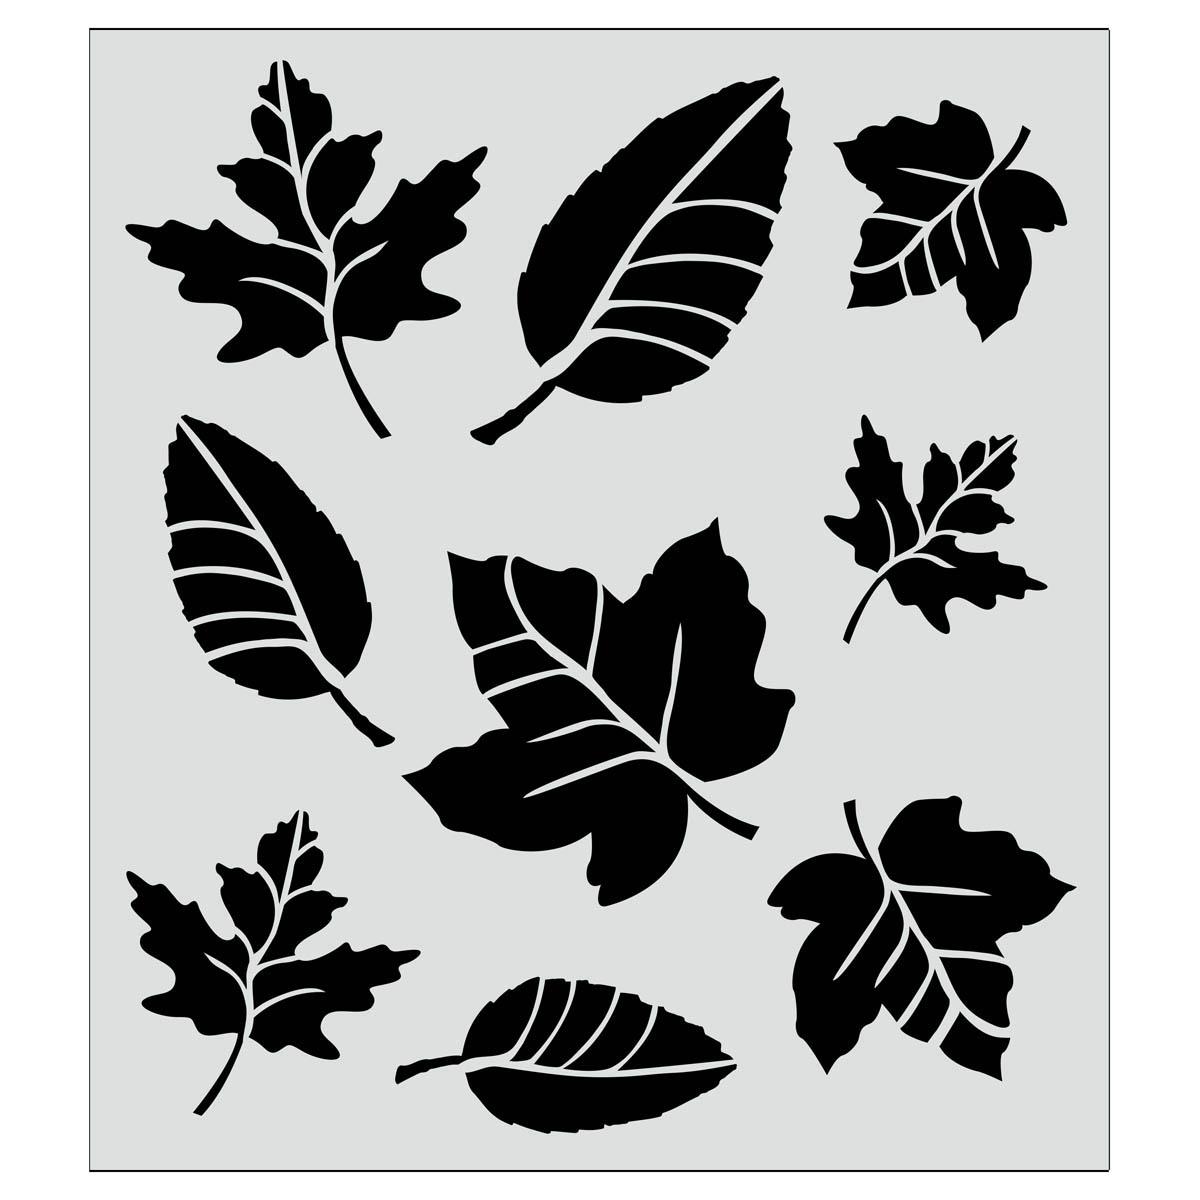 FolkArt ® Painting Stencils - Leaf Variety - 30731